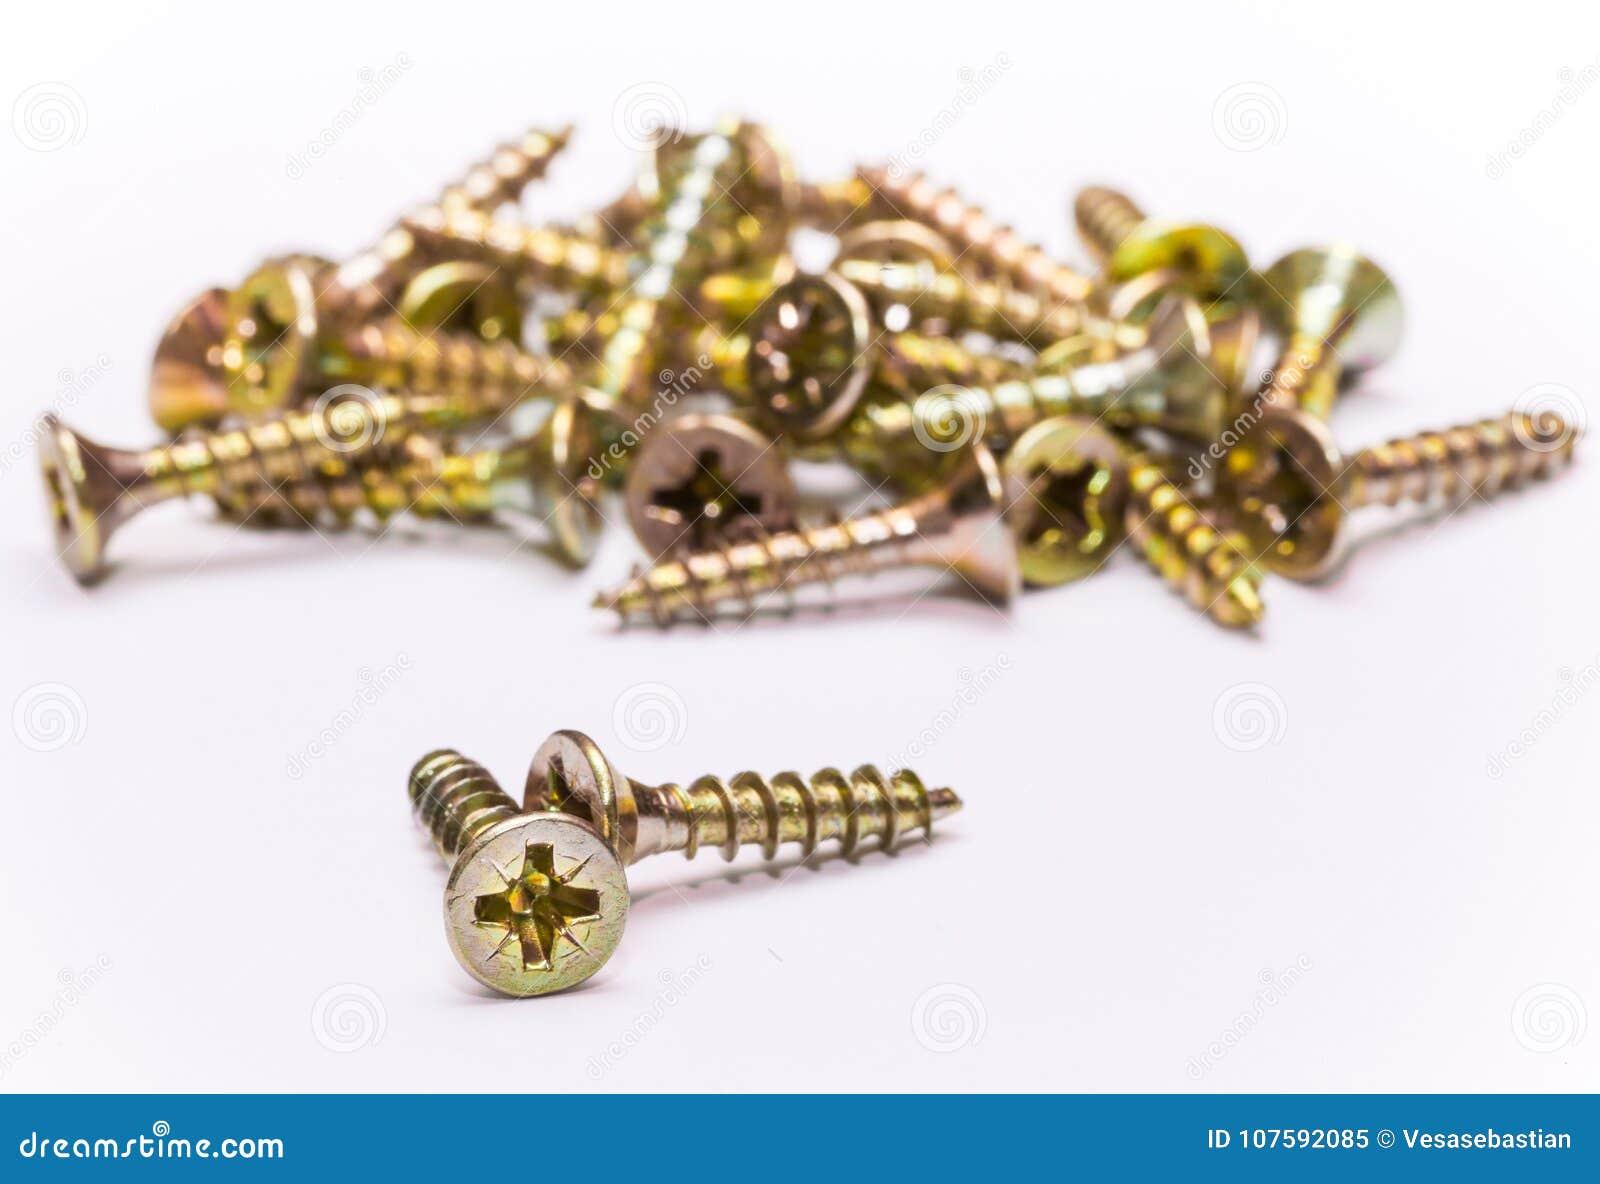 Bunch of yellow zinc coated philips flat head cross screws - fasteners